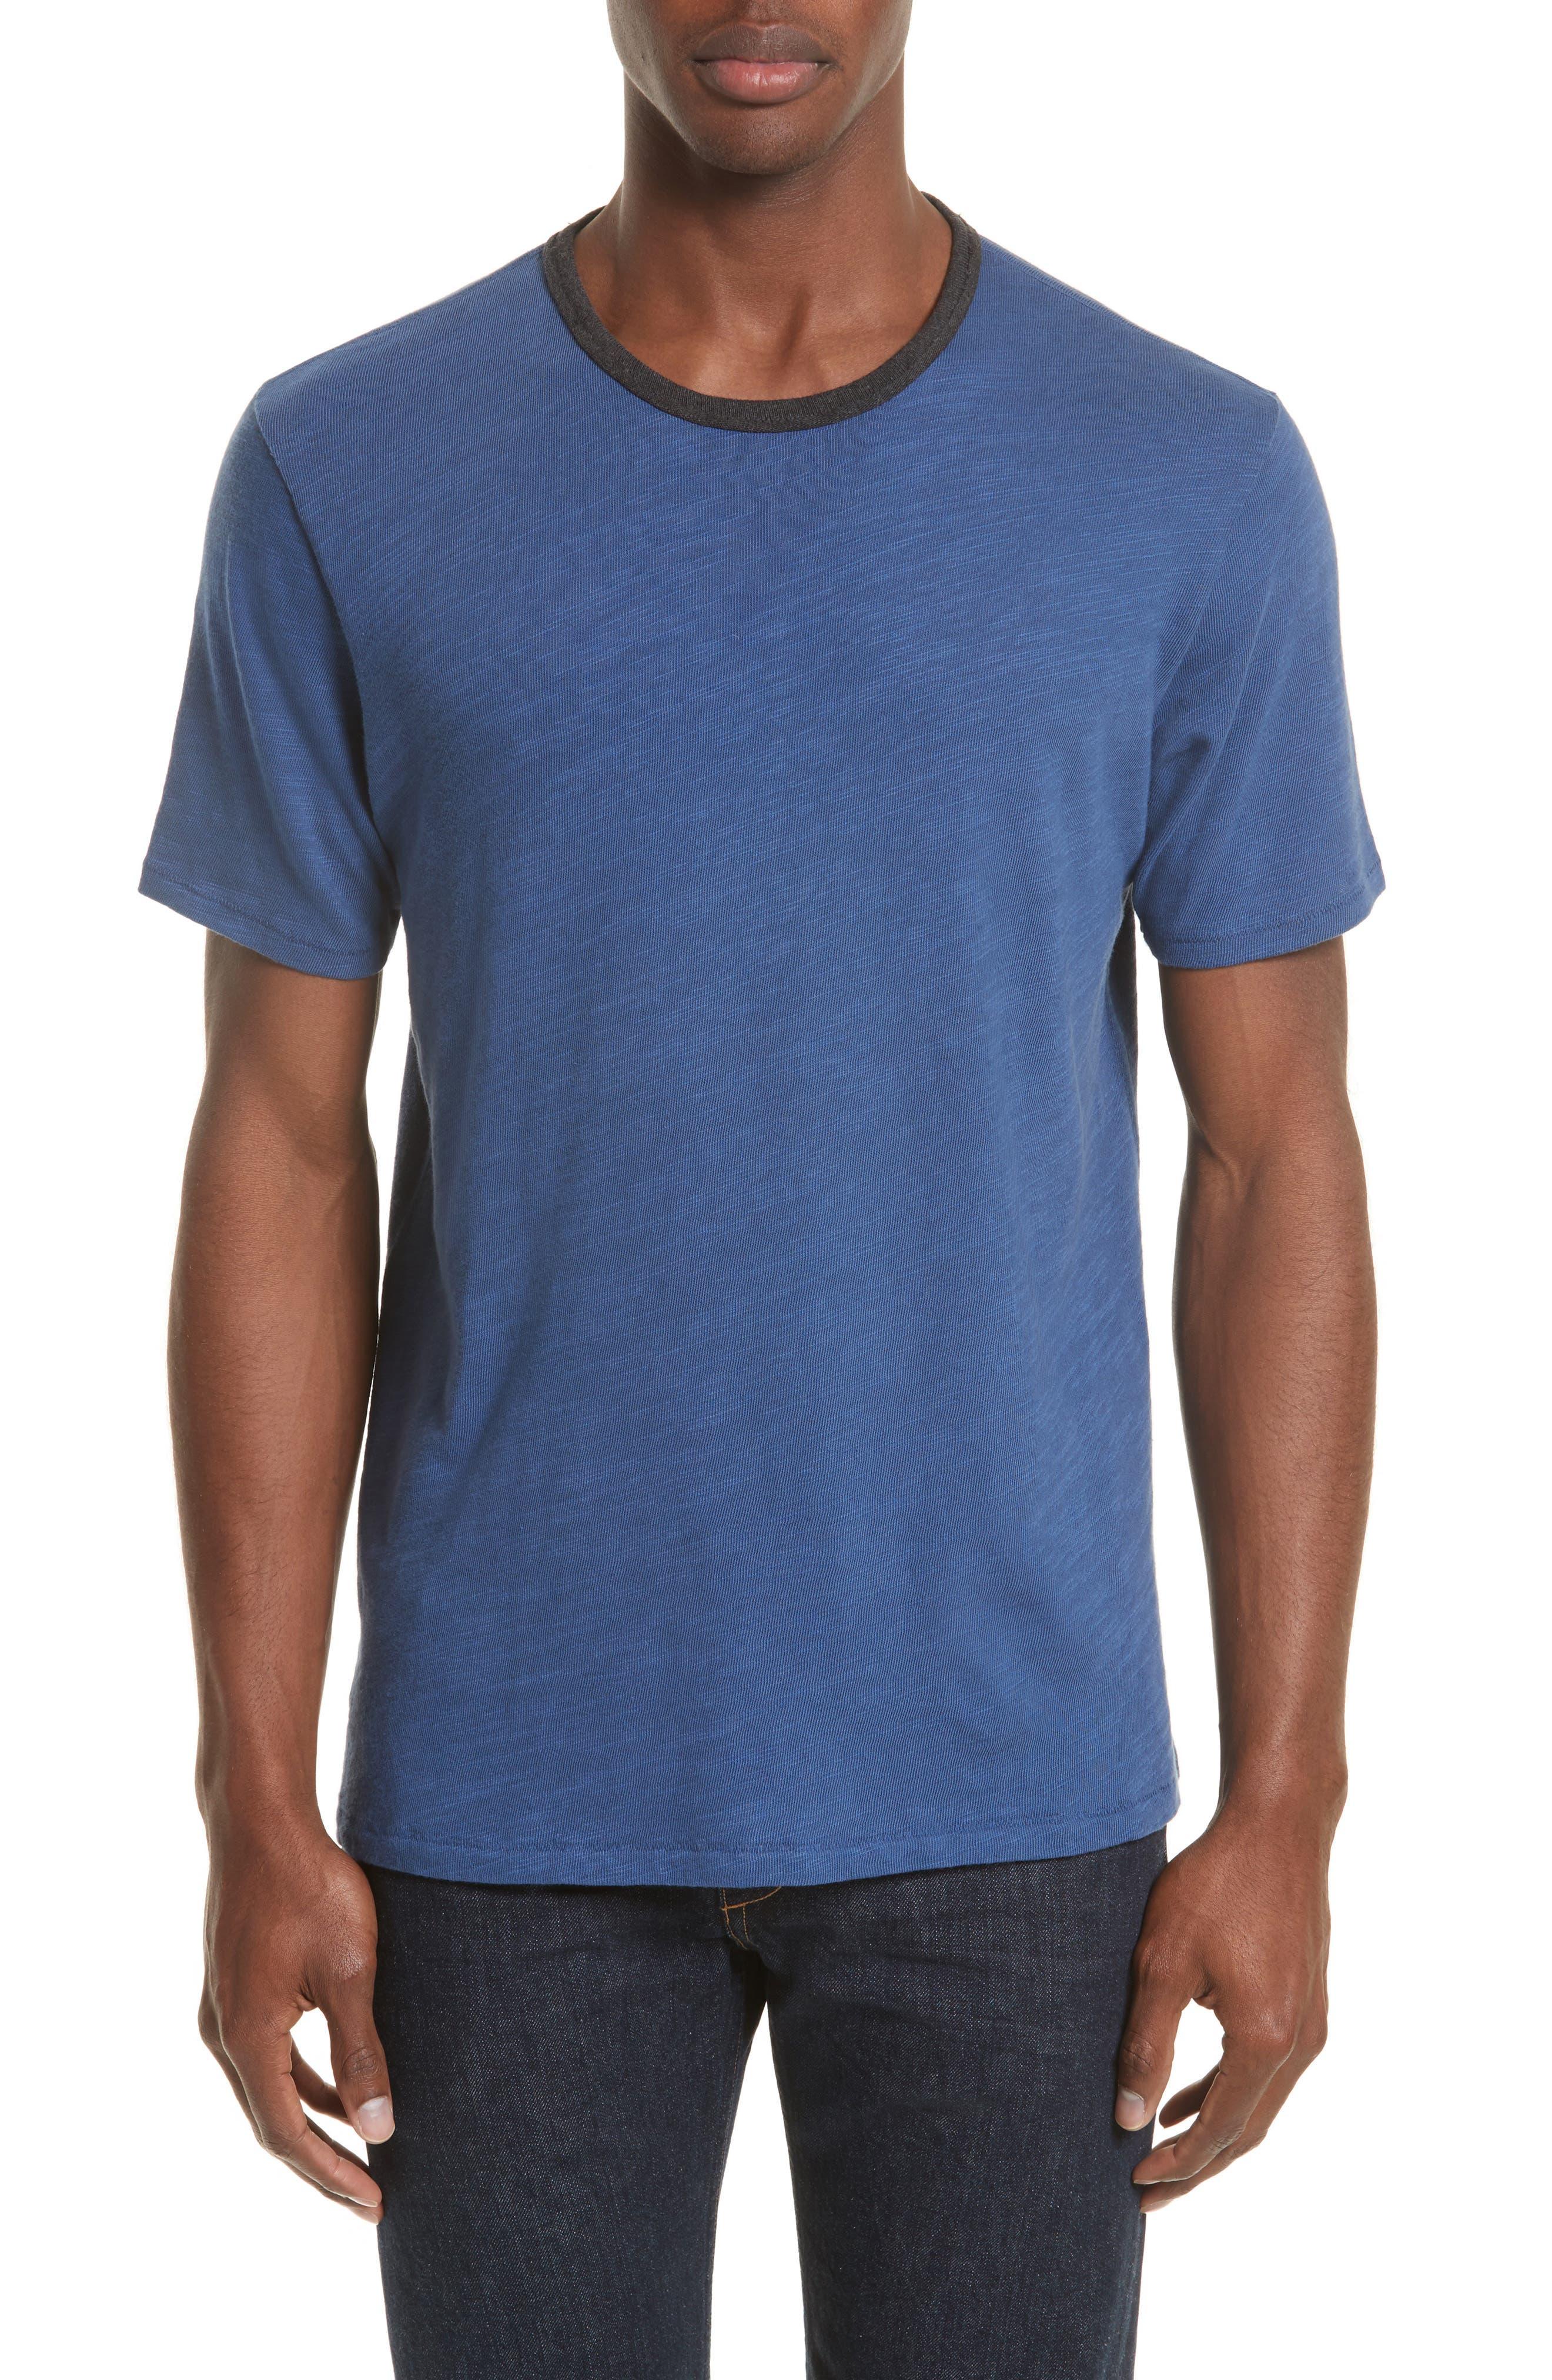 Alternate Image 1 Selected - rag & bone Slub Cotton Jersey T-Shirt